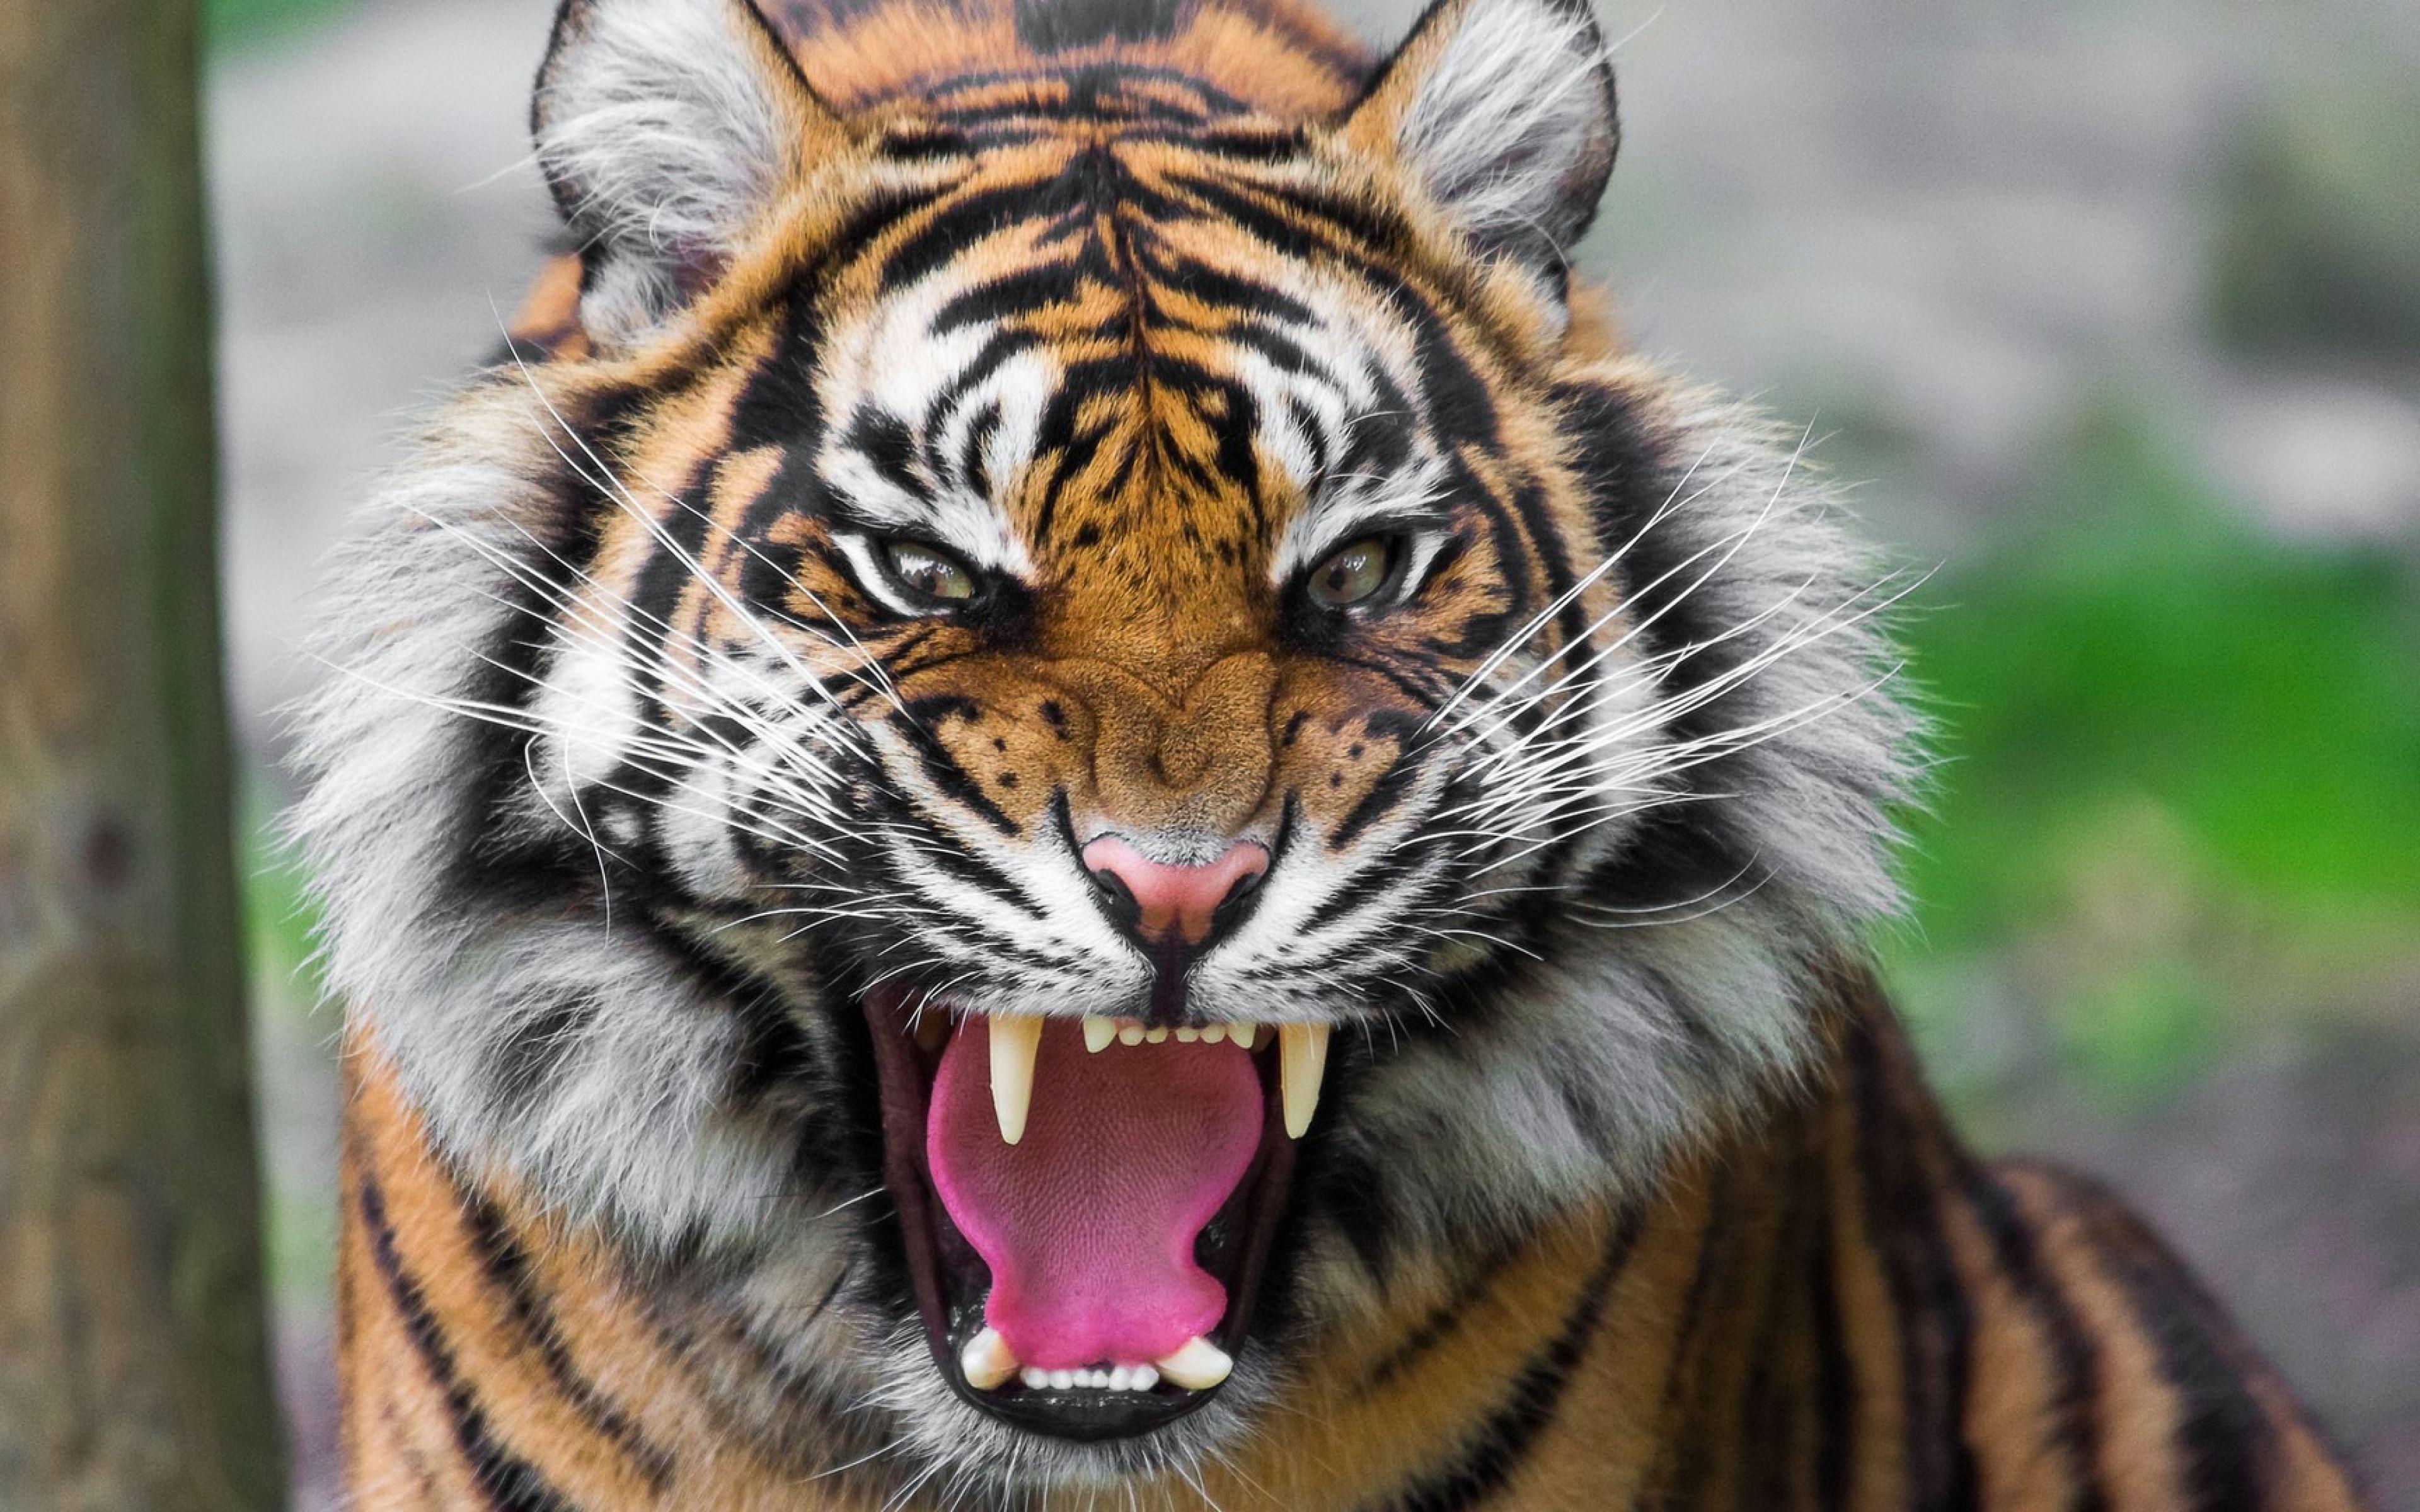 Tiger Resting 4k Hd Desktop Wallpaper For 4k Ultra Hd Tv: Angry Tiger Eyes Wallpapers